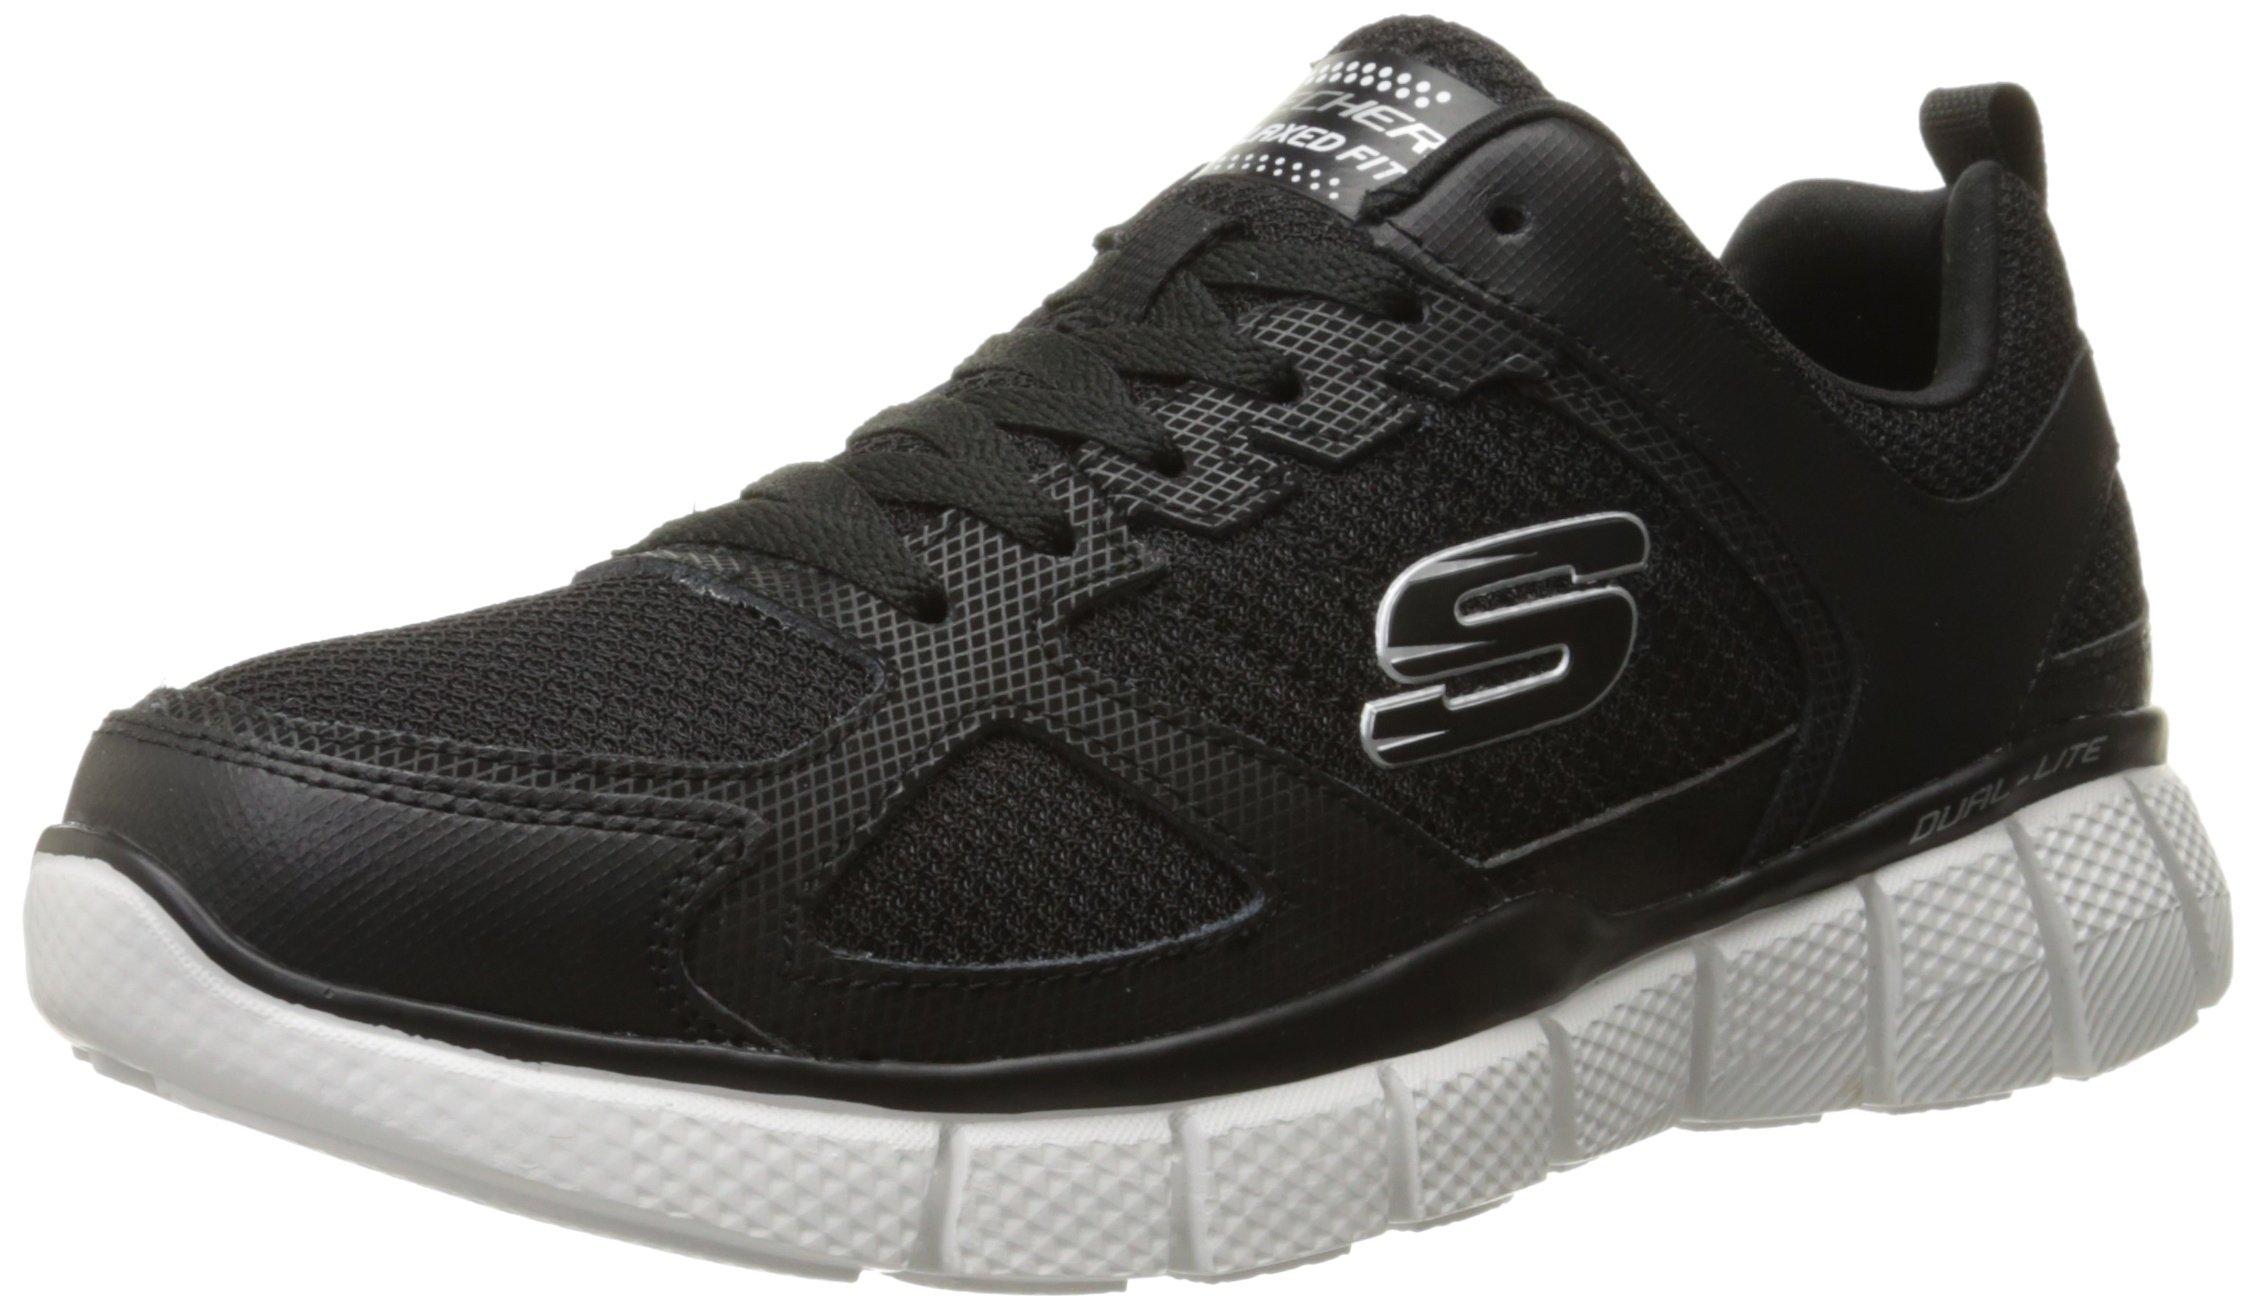 Skechers Sport Men's Equalizer 2.0 True Balance Sneaker,Black/White,7 M US